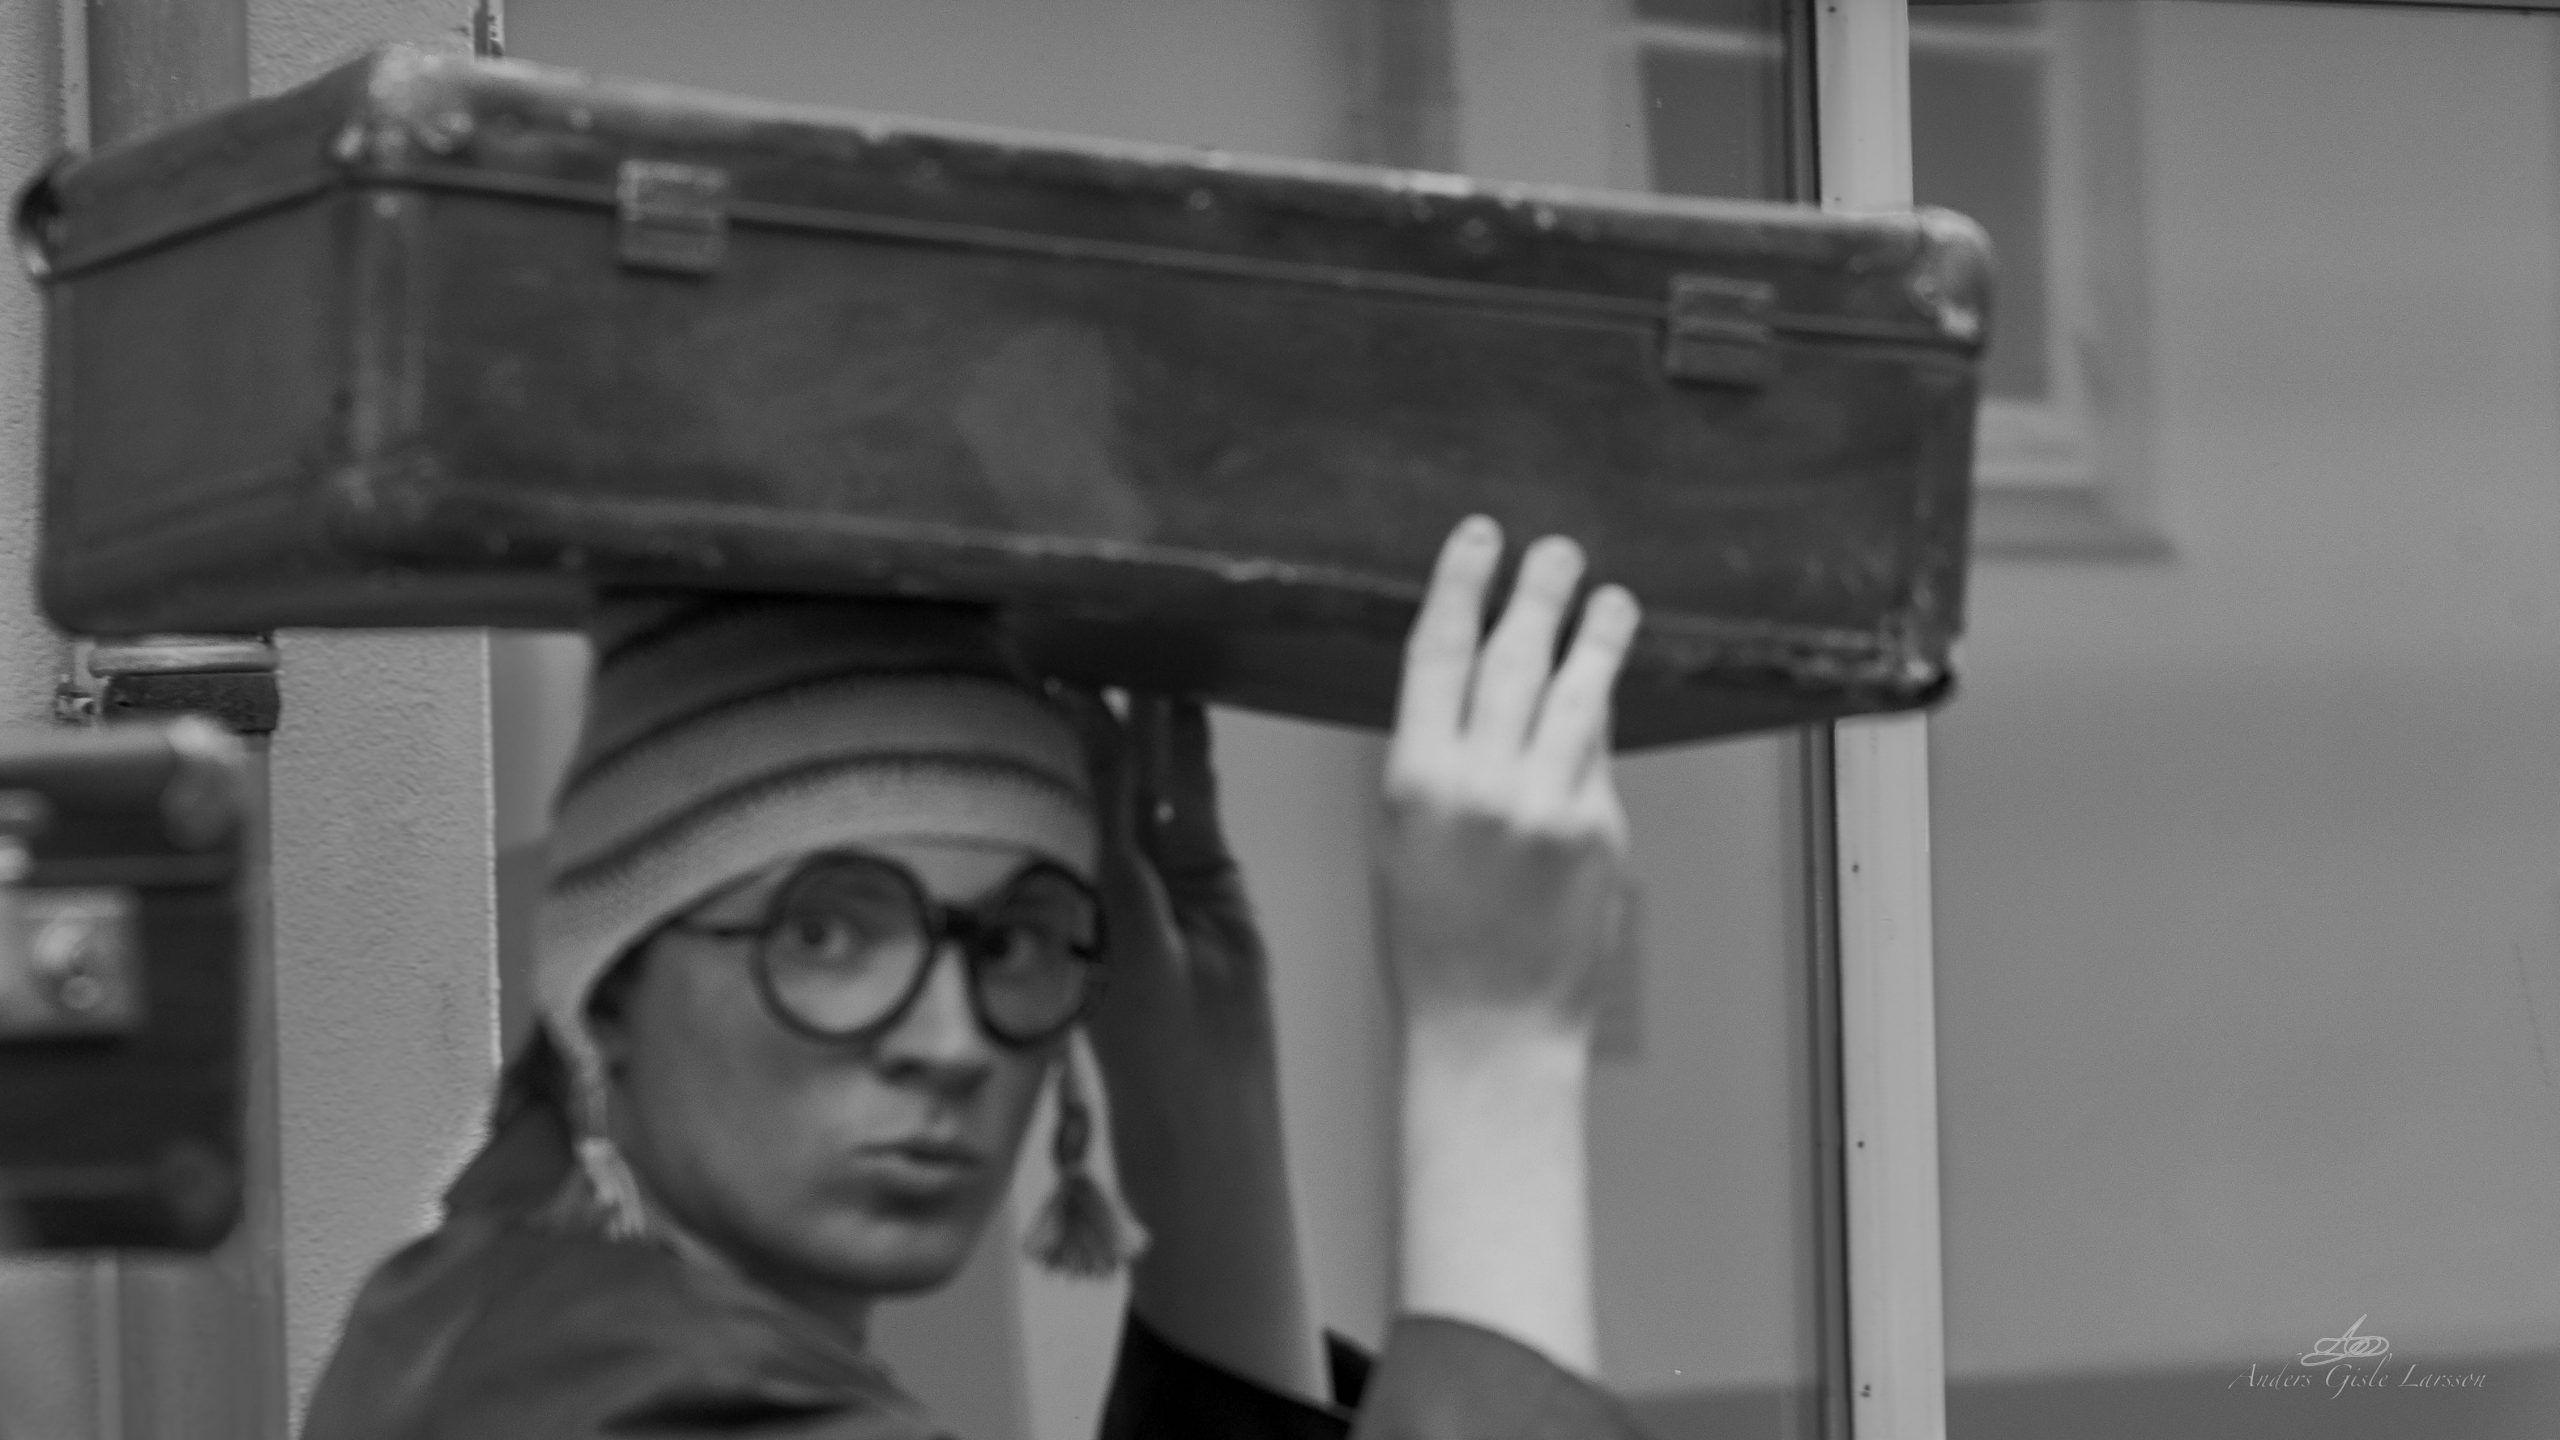 Kuffertpigen, Uge 24, Randers